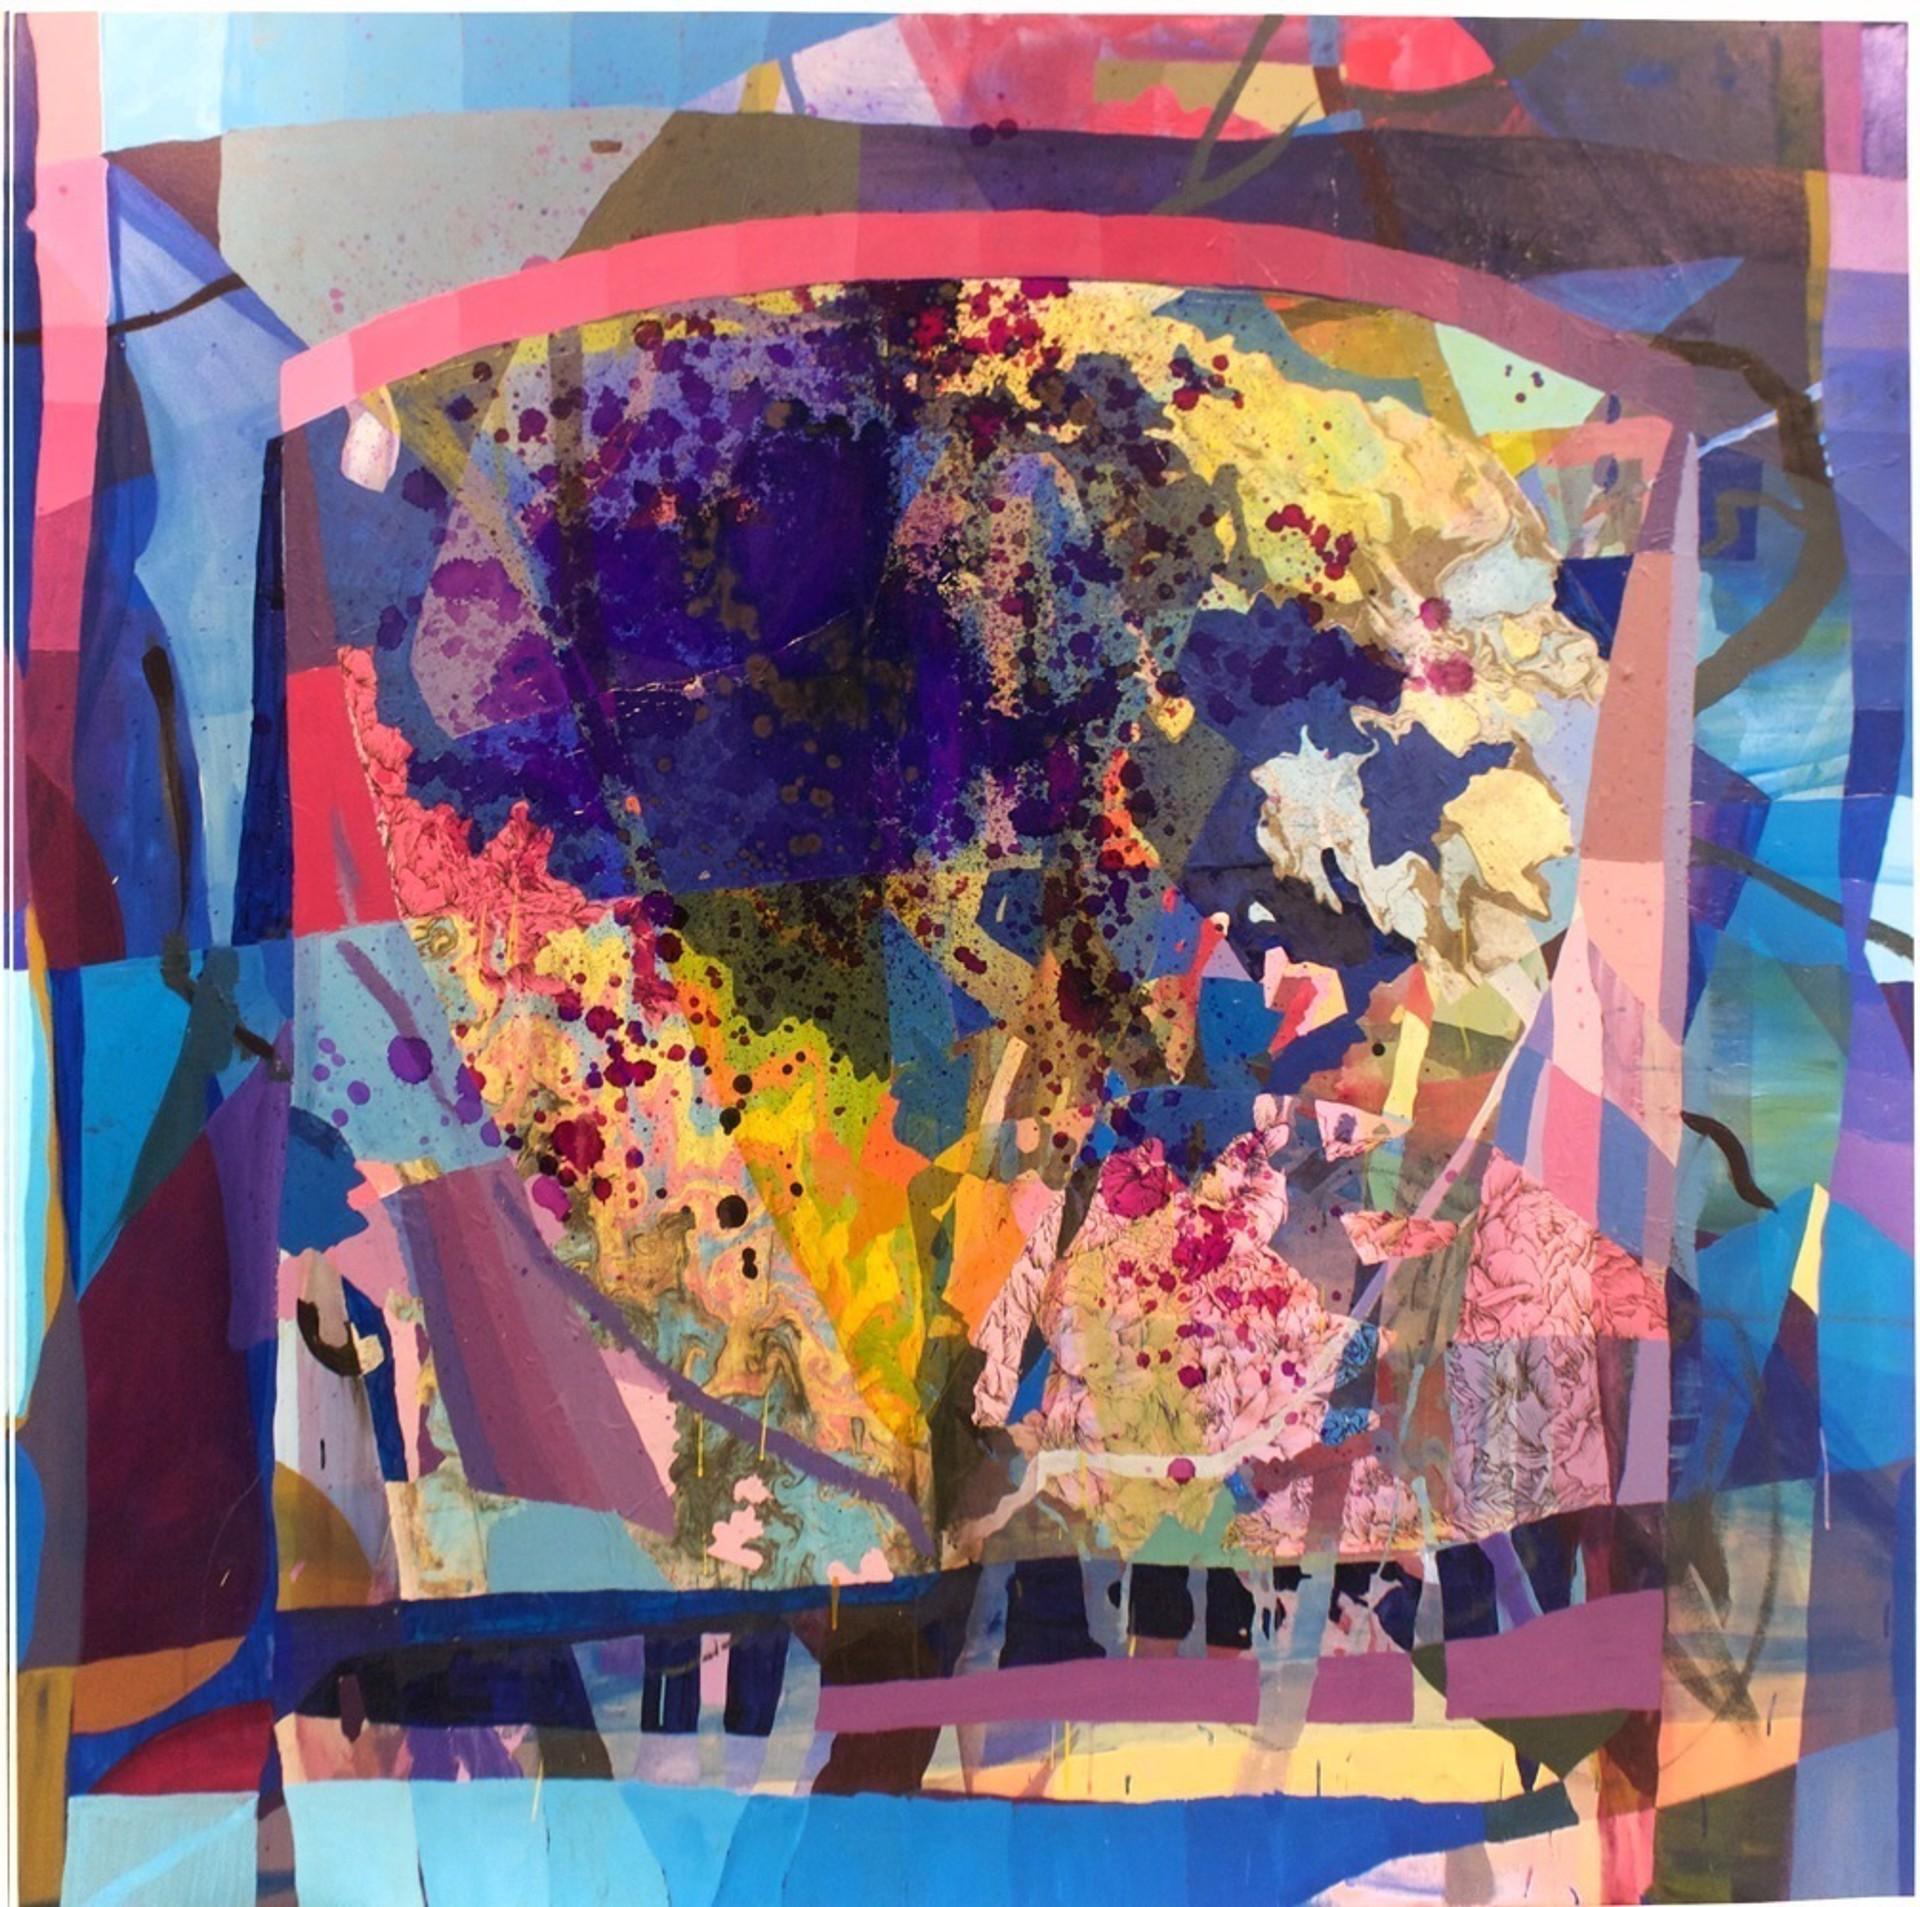 Window by Katherine Tzu Lan Mann